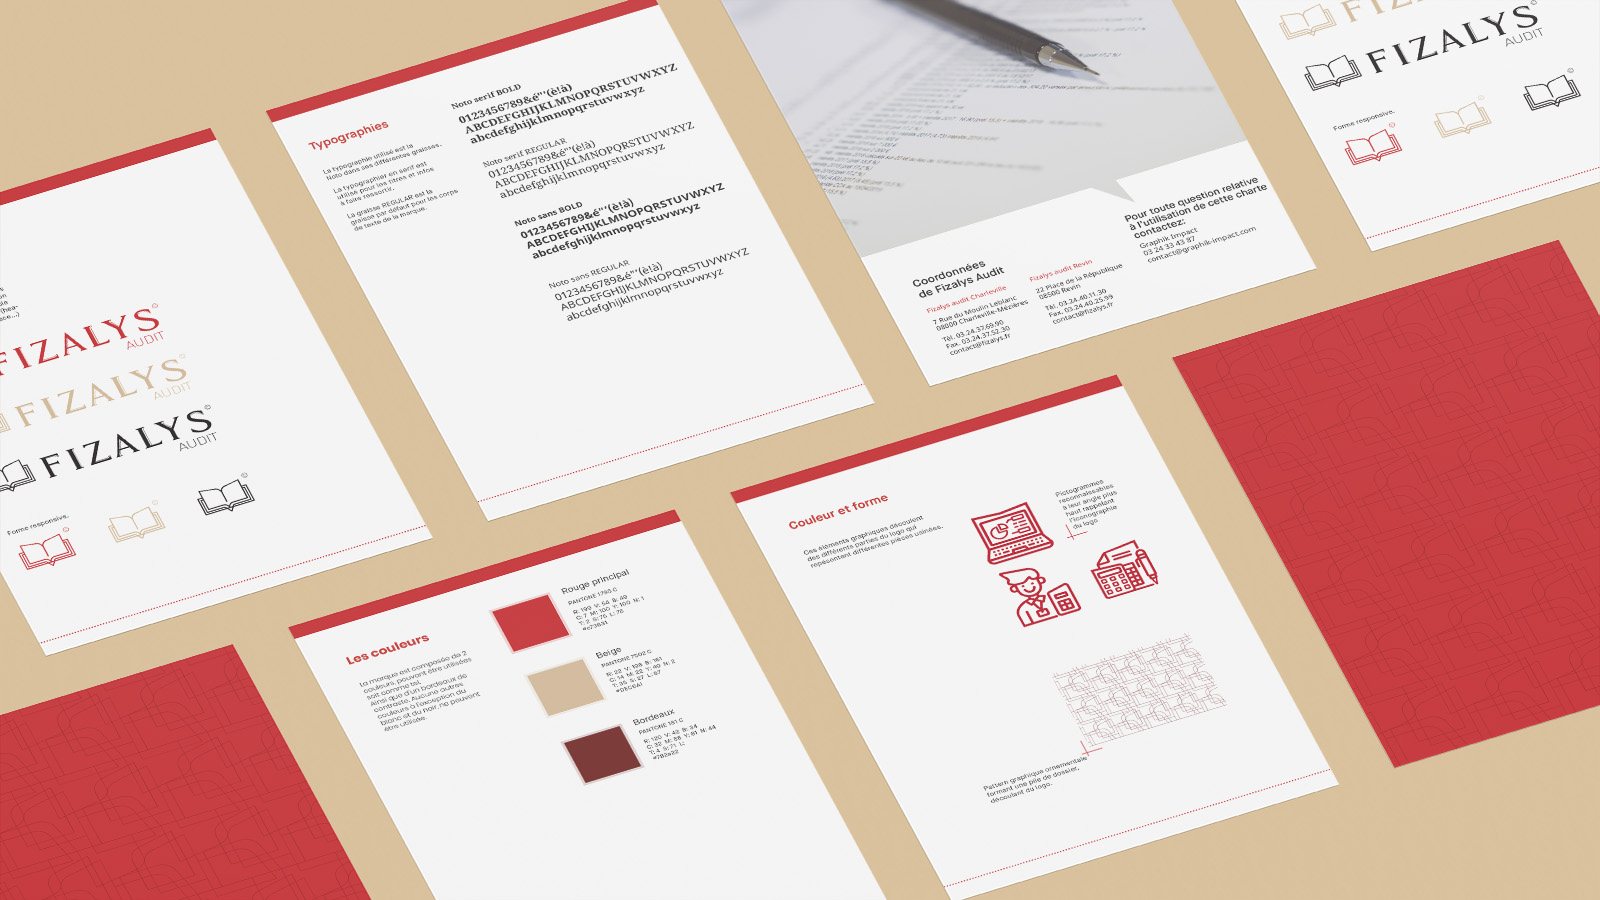 Charte Graphique - Fizalys